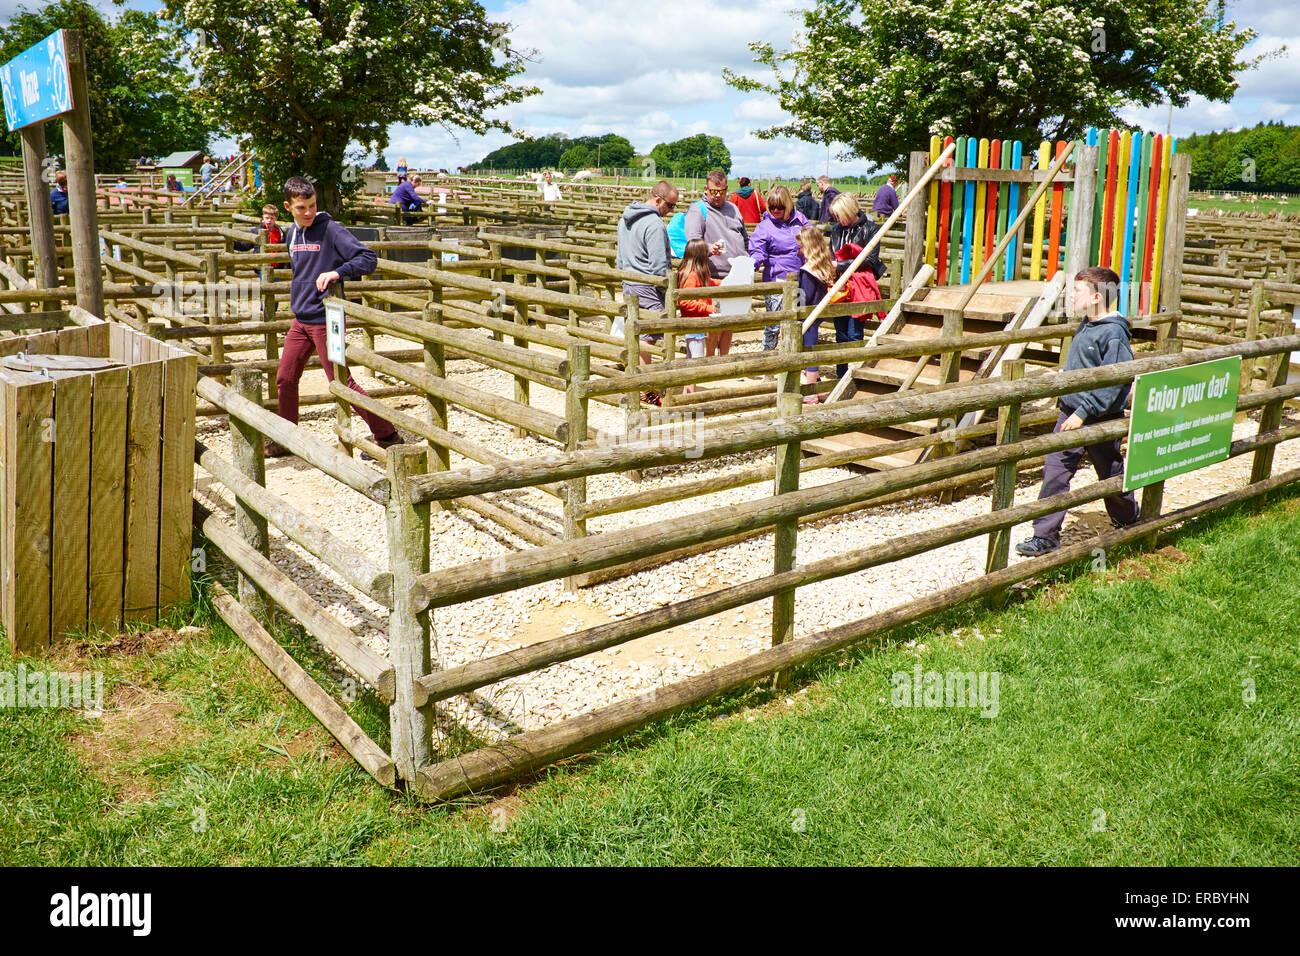 A Fence Maze At Cotswold Farm Park Bemborough Farm Kineton UK - Stock Image